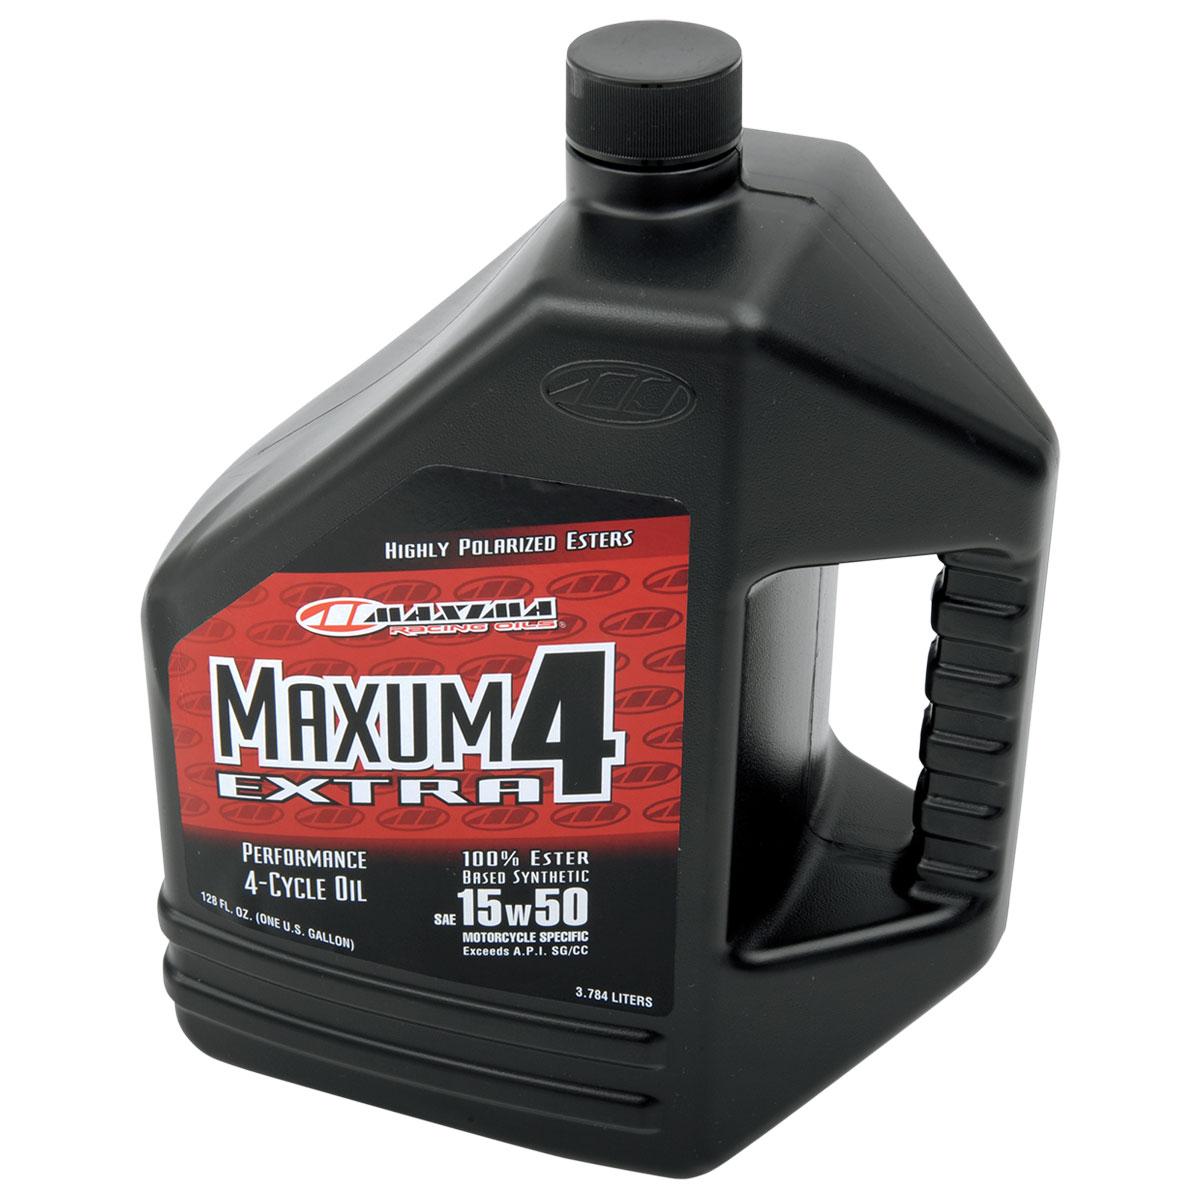 Maxima Maxum4 Extra Synthetic 15W50 Engine Oil Gallon